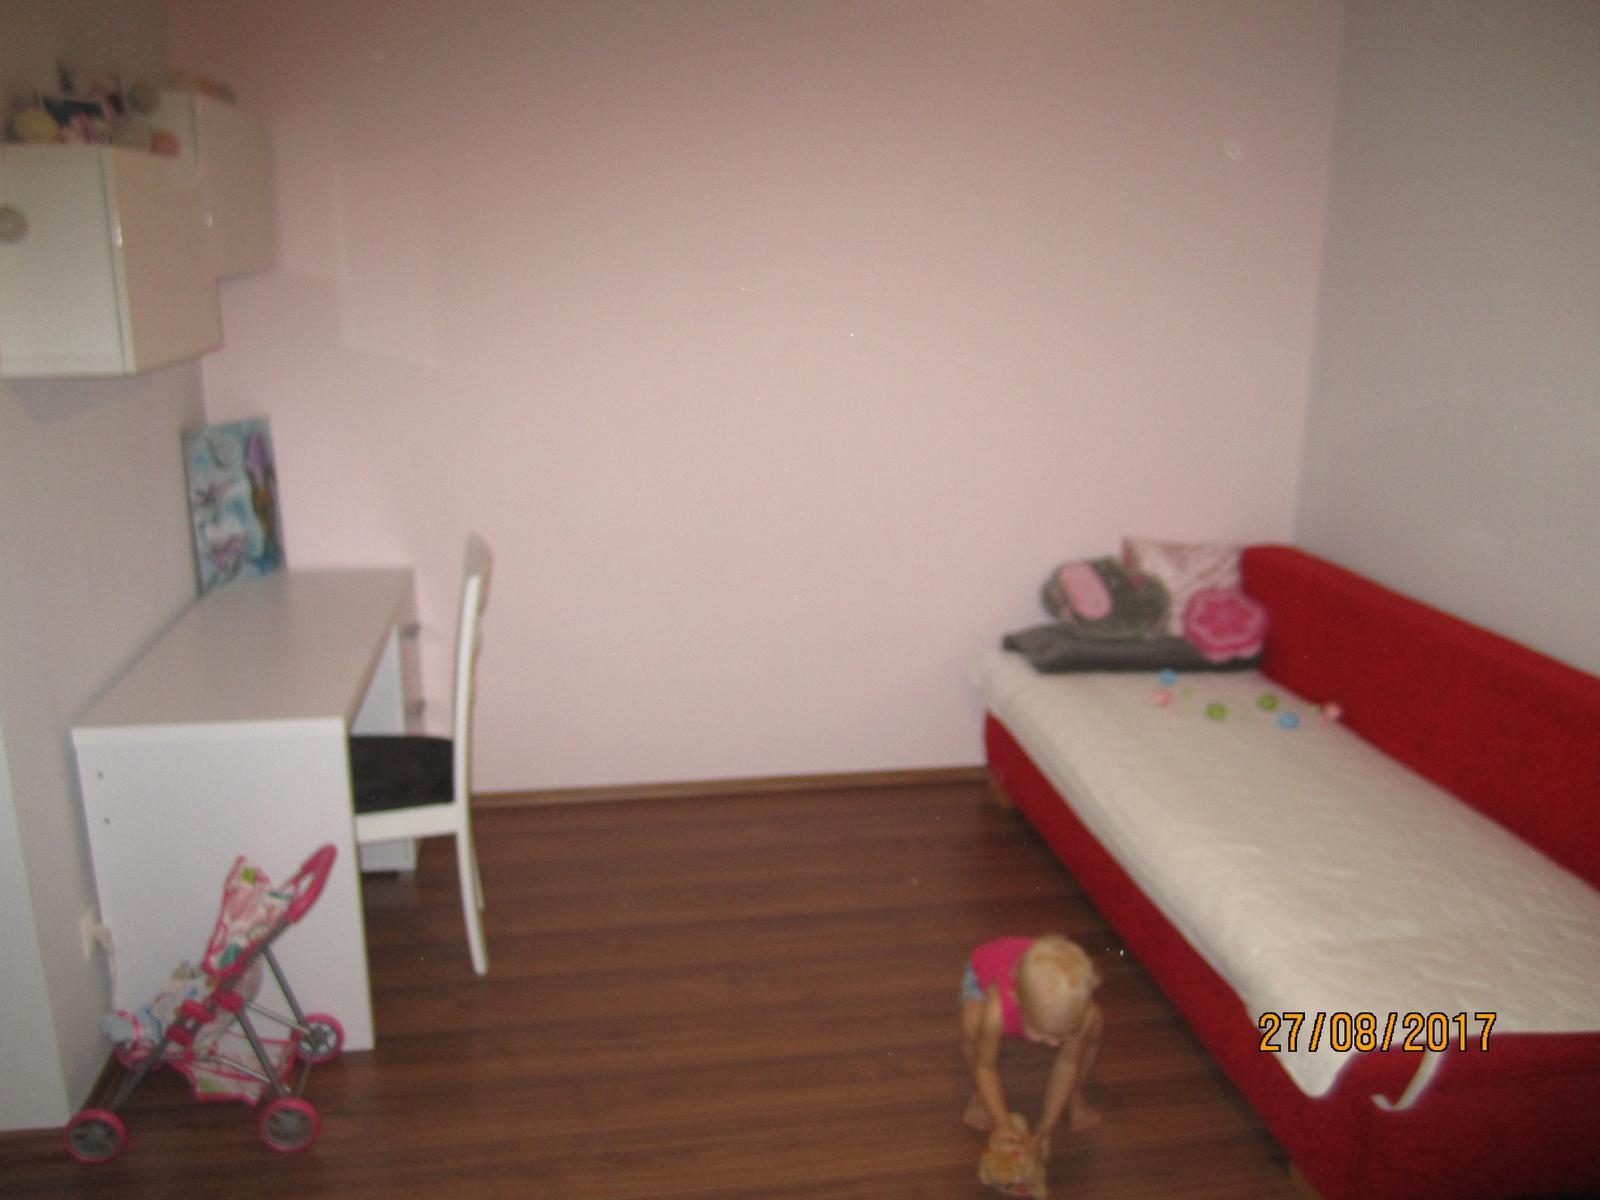 Projekt hostovska  nakoniec detska :-D - sice rozmazane, ale realnejsie farby...postel bude ina.. biela z IKEA